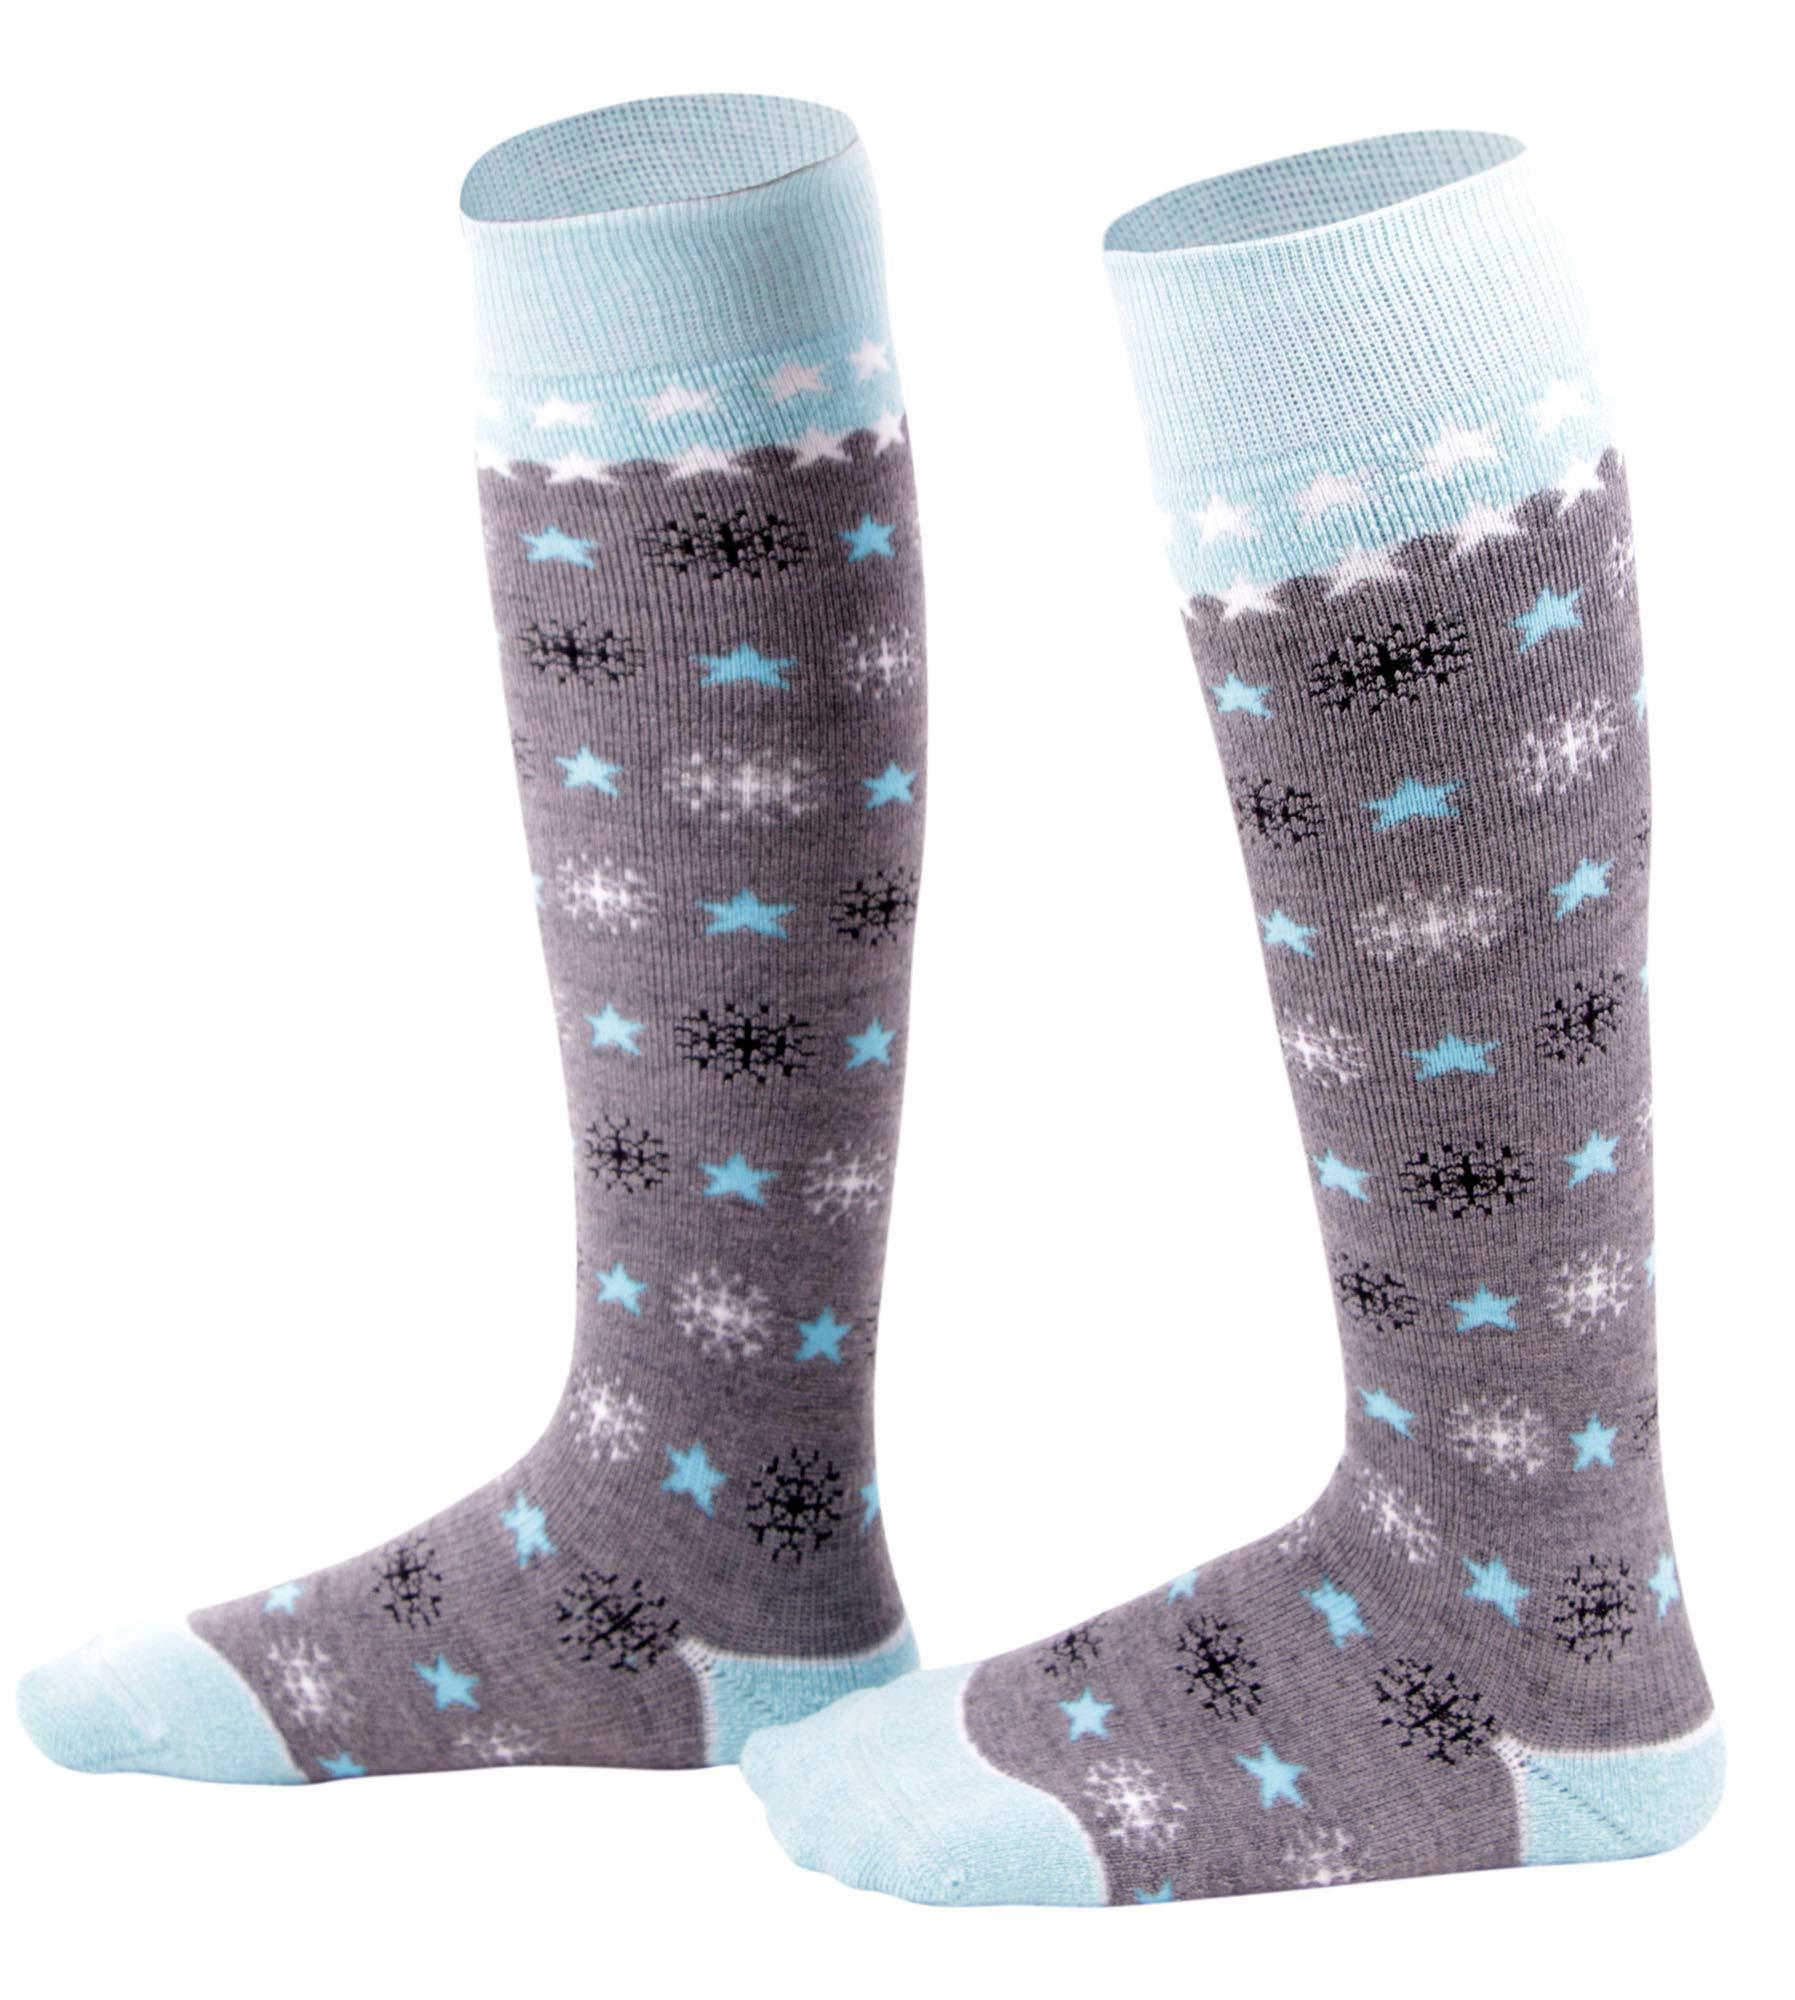 Kids Ski Socks Full Terry Lightweight Warm Merino Wool Skiing Socks